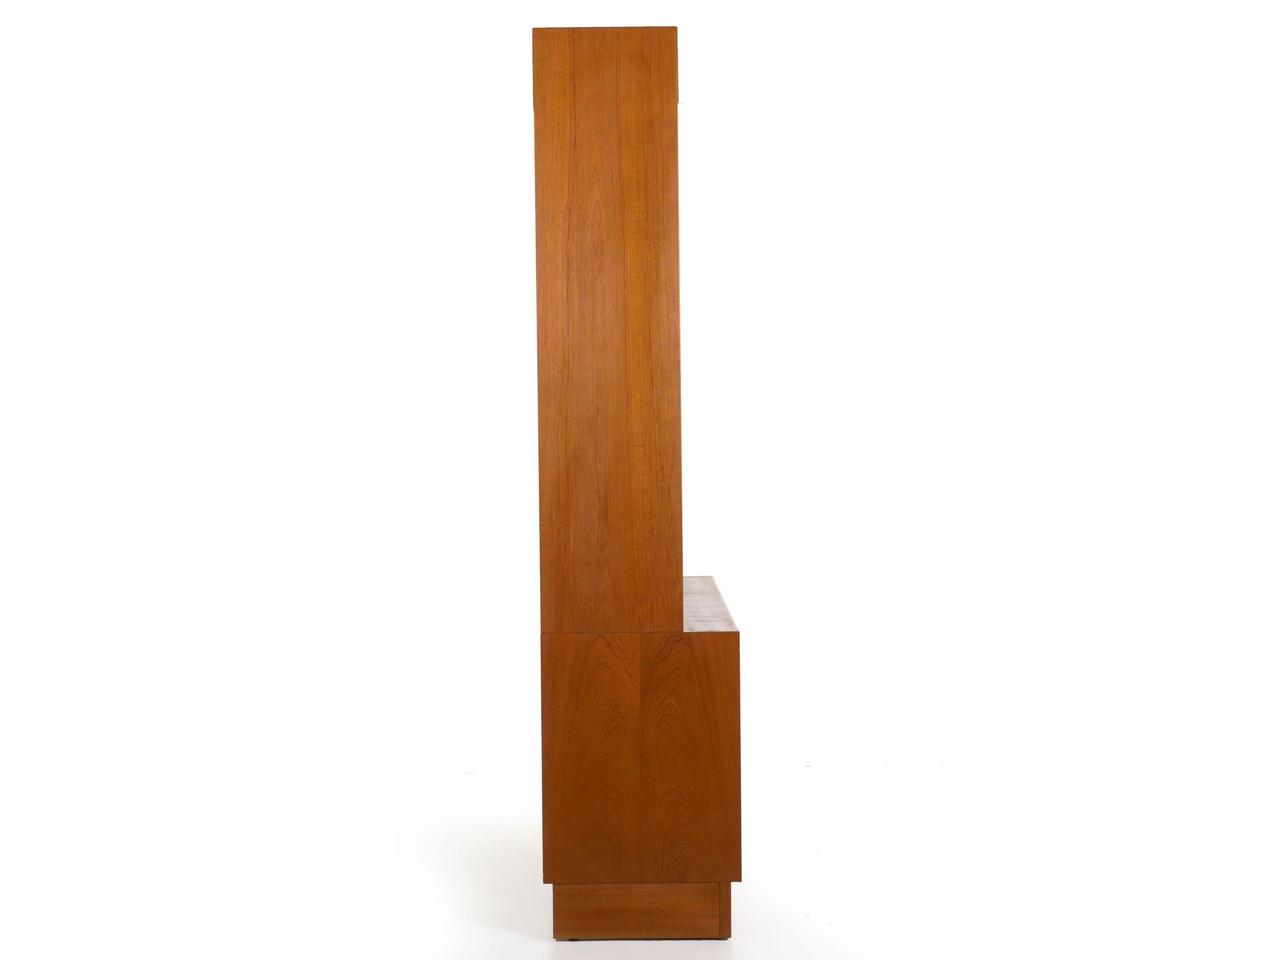 Danish Mid Century Modern Teak Bookcase Cabinet Poul Hundevad